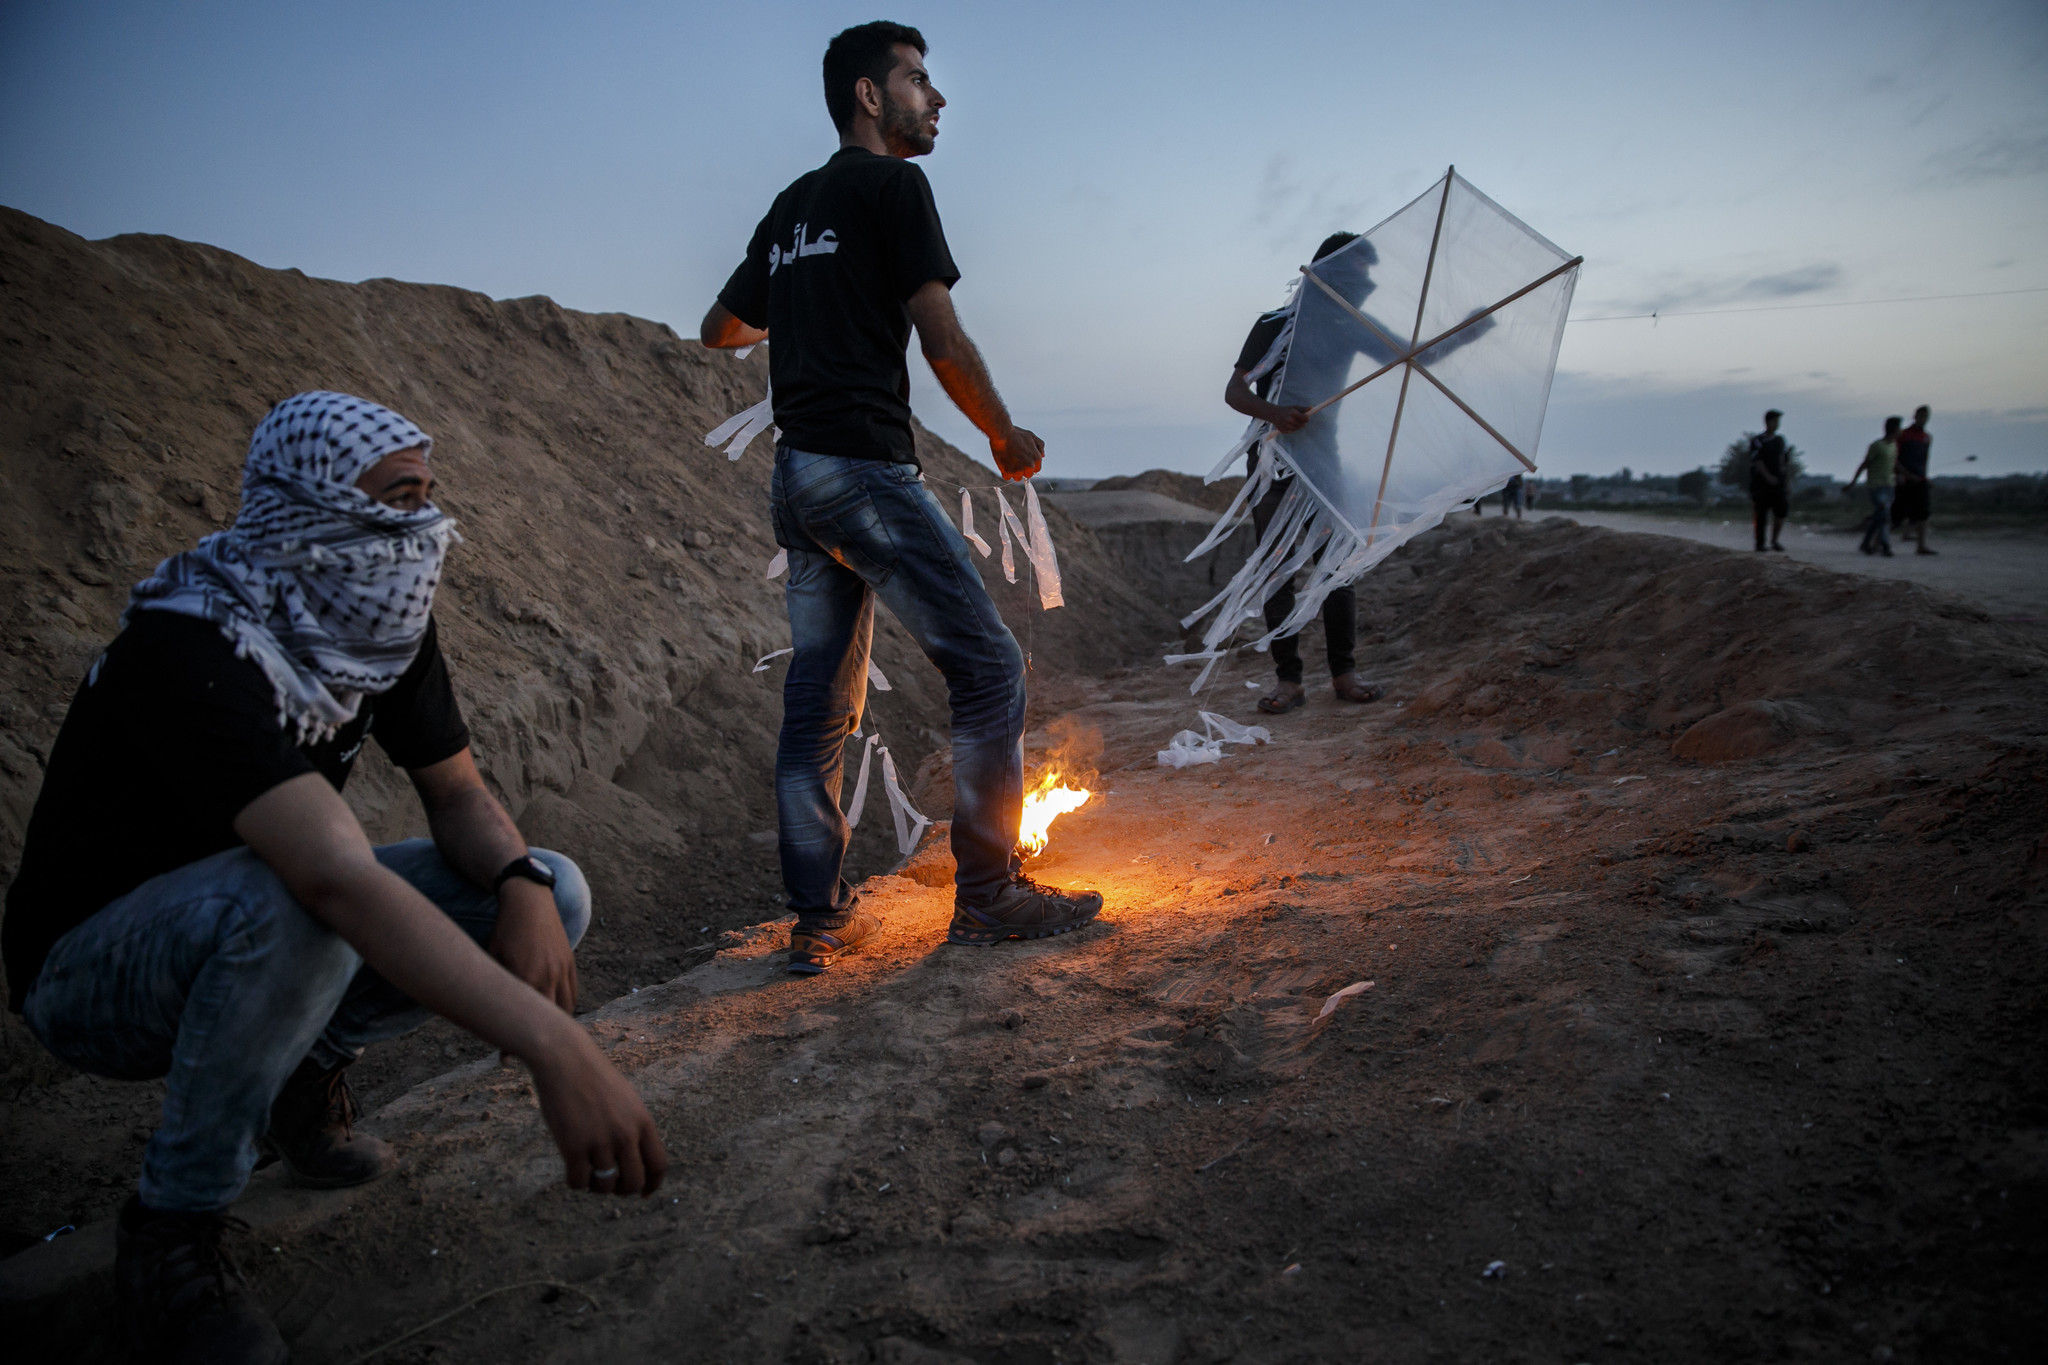 DEIR AL-BALA, GAZA STRIP — WEDNESDAY, MAY 9, 2018: Palestinians test out their kites that carry tor